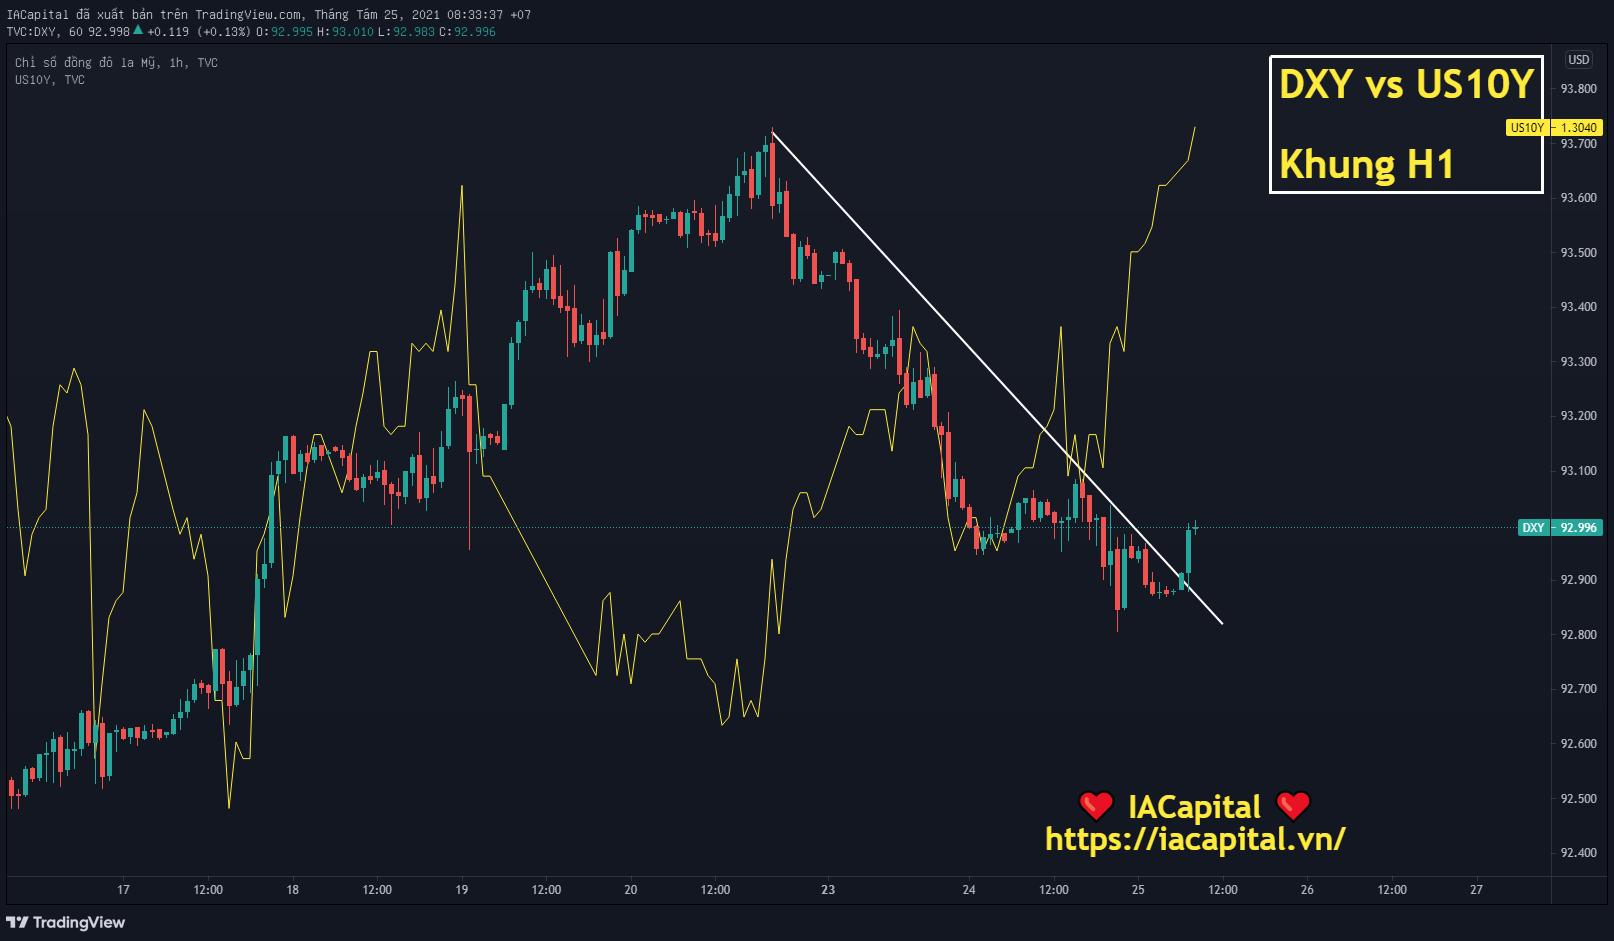 https://s3.tradingview.com/snapshots/r/r93eNsCK.png